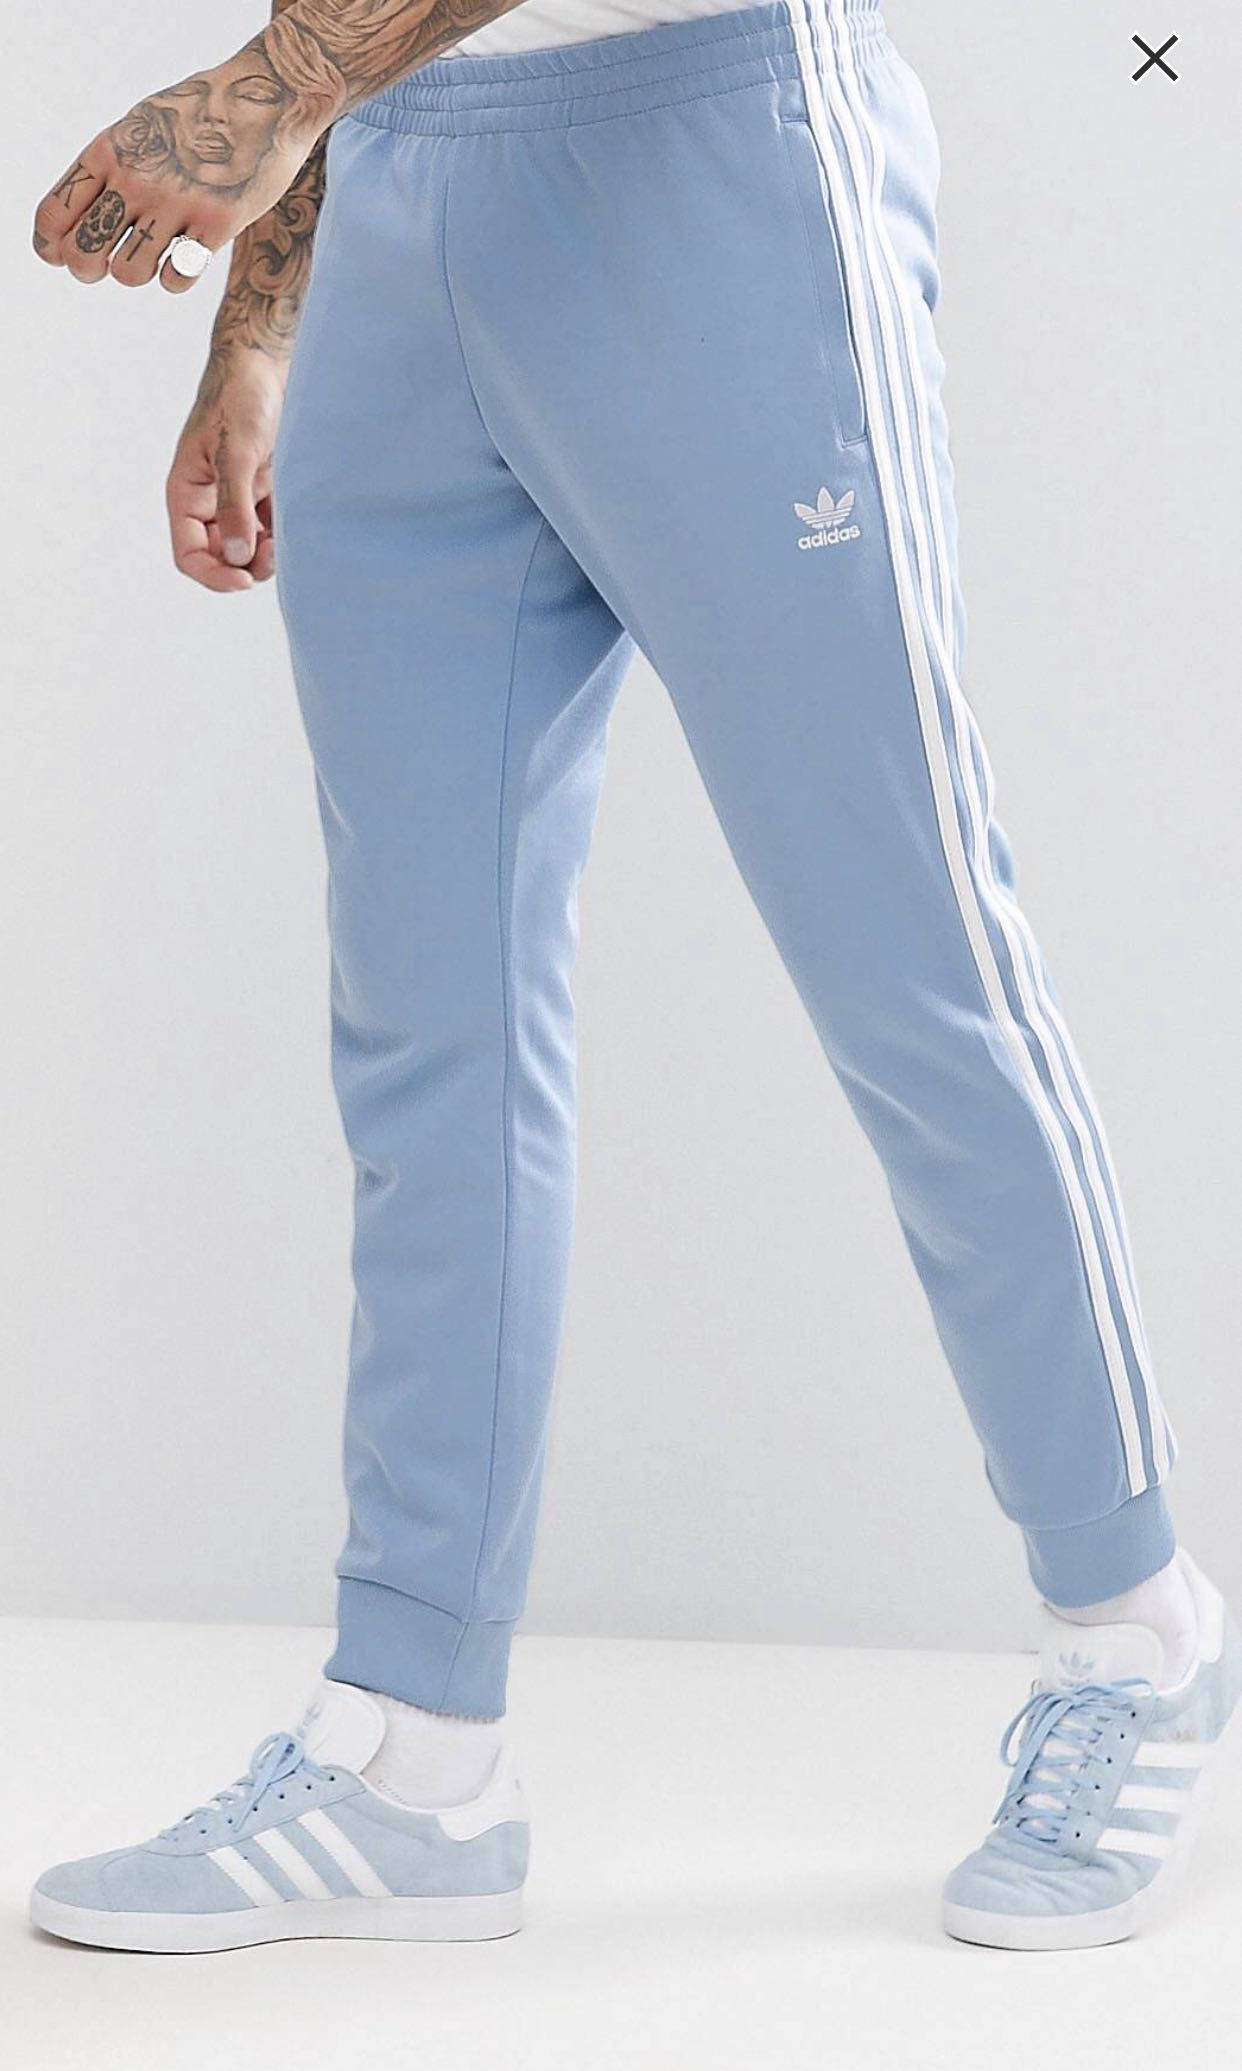 b435b7fd4241 Adidas Track Pants